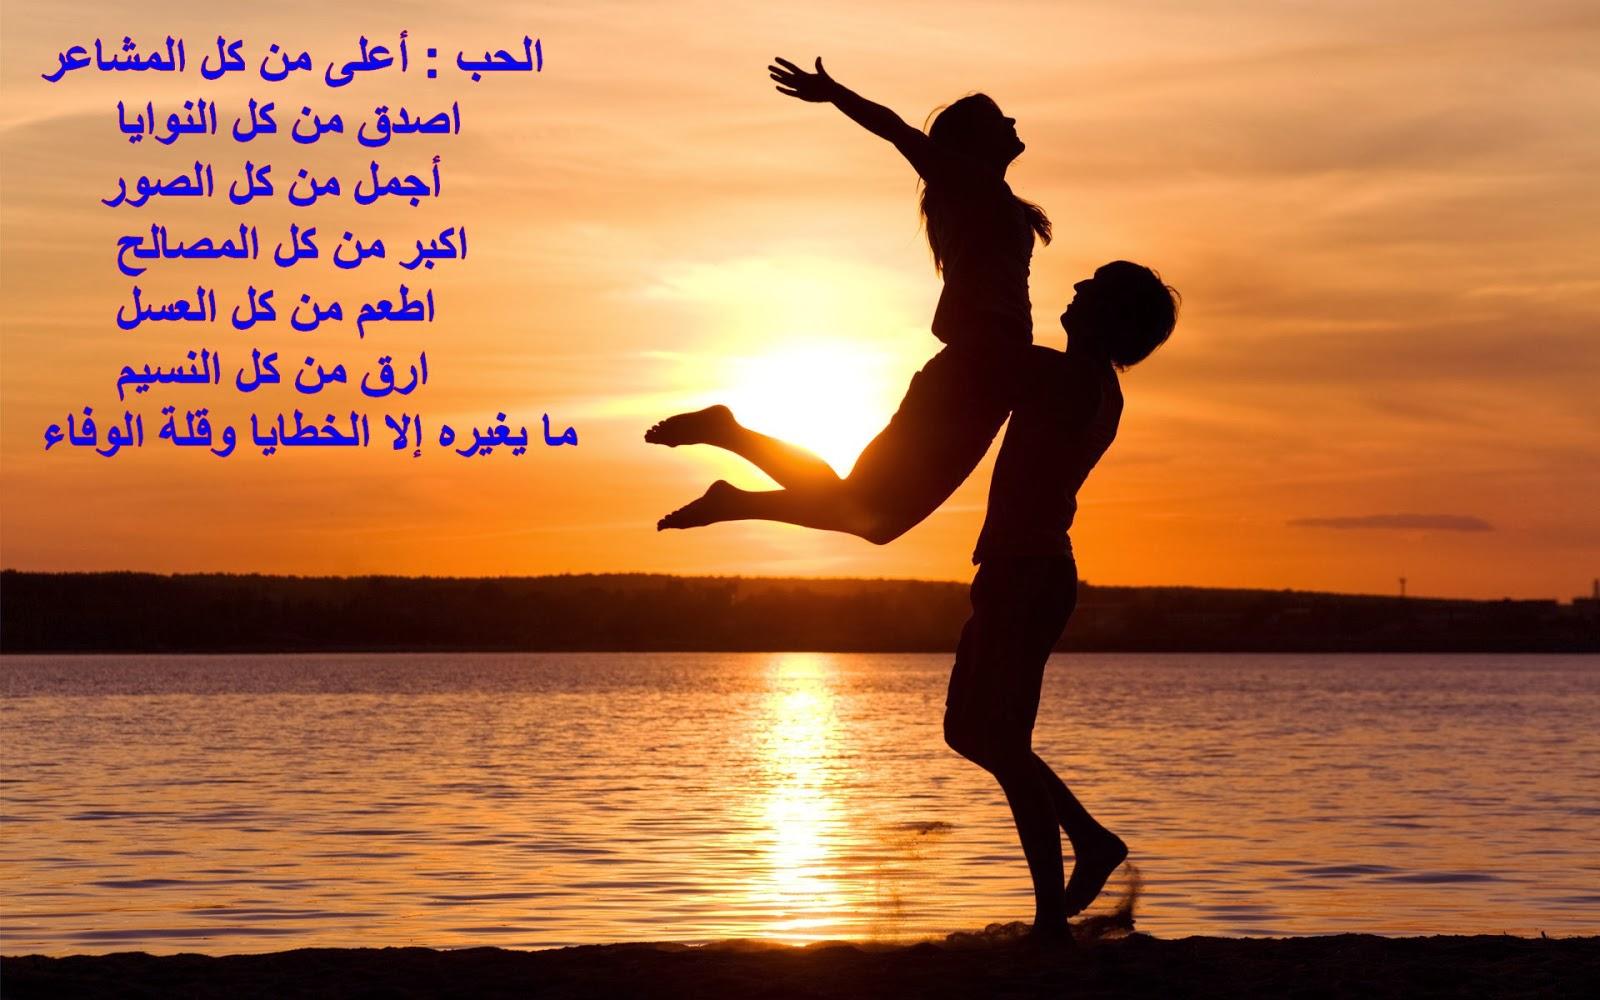 أجمل صور حب مكتوب عليها كلام عبارات شعر وخواطر رومانسية , photos love poetry and romantic